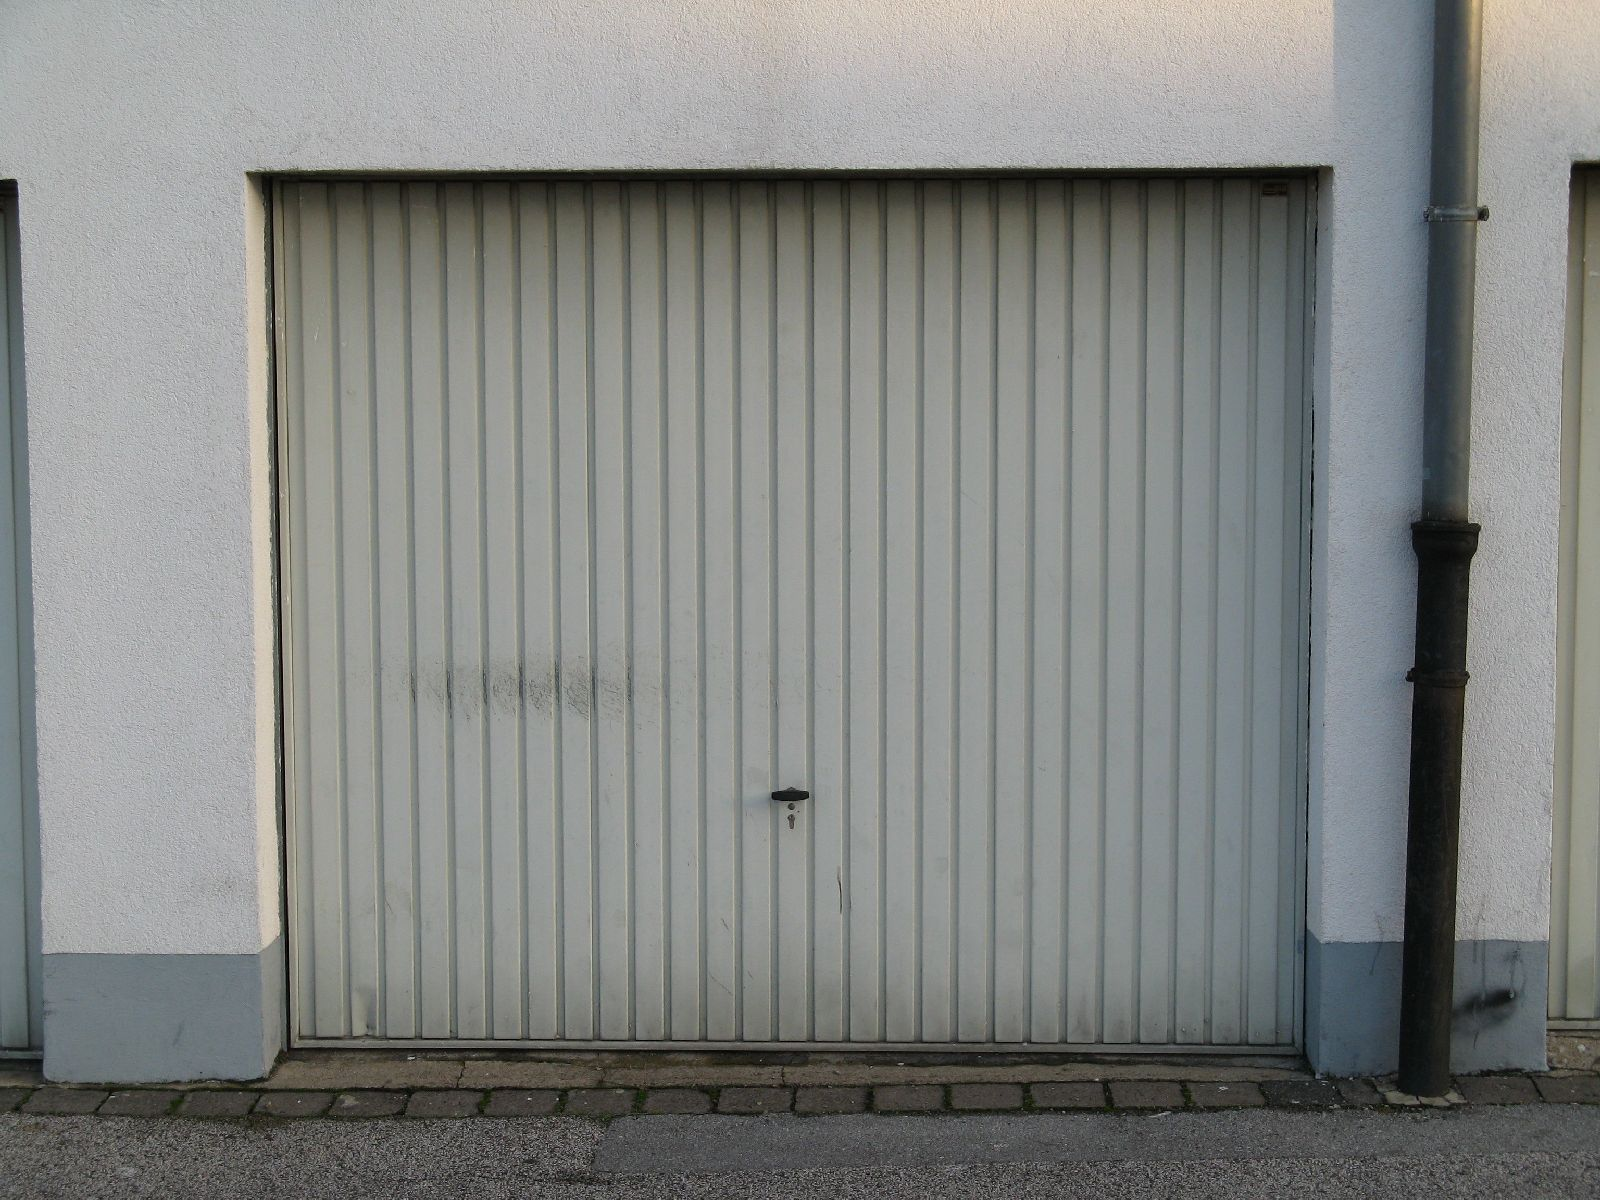 Building_Texture_B_1023